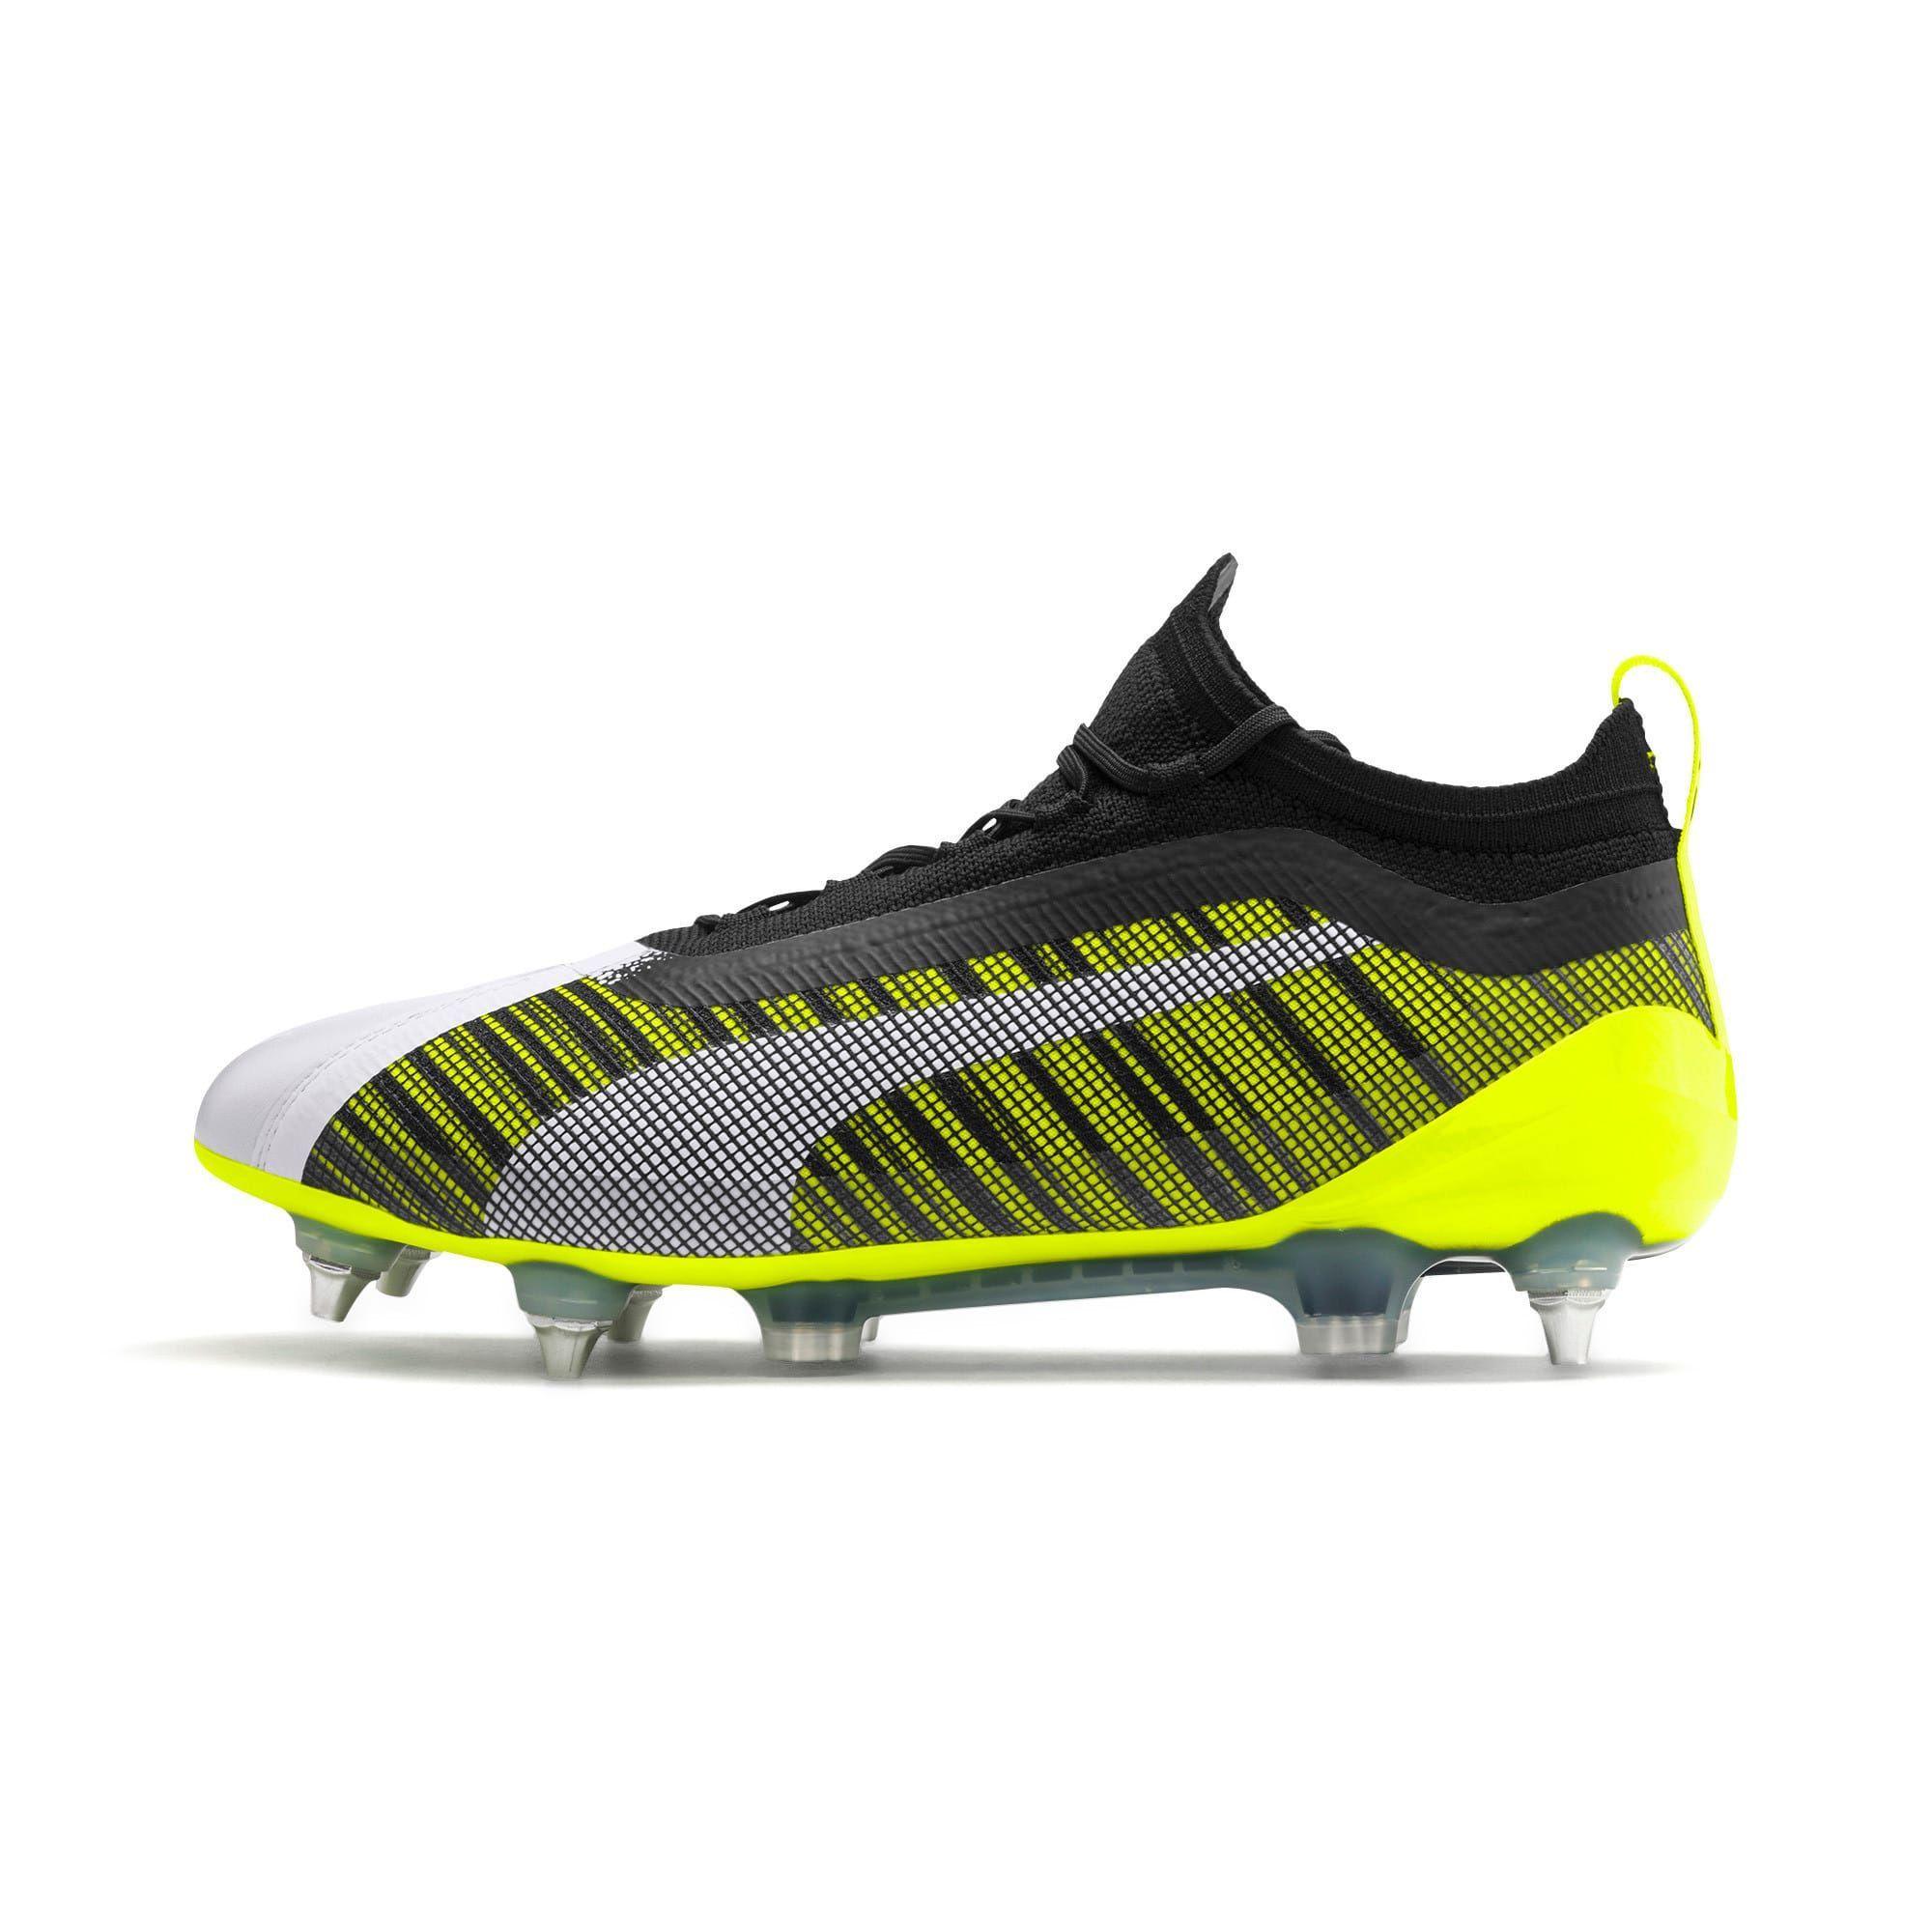 Puma One 5 1 Mxsg Football Boots In 2020 Mens Football Boots Football Boots Boots